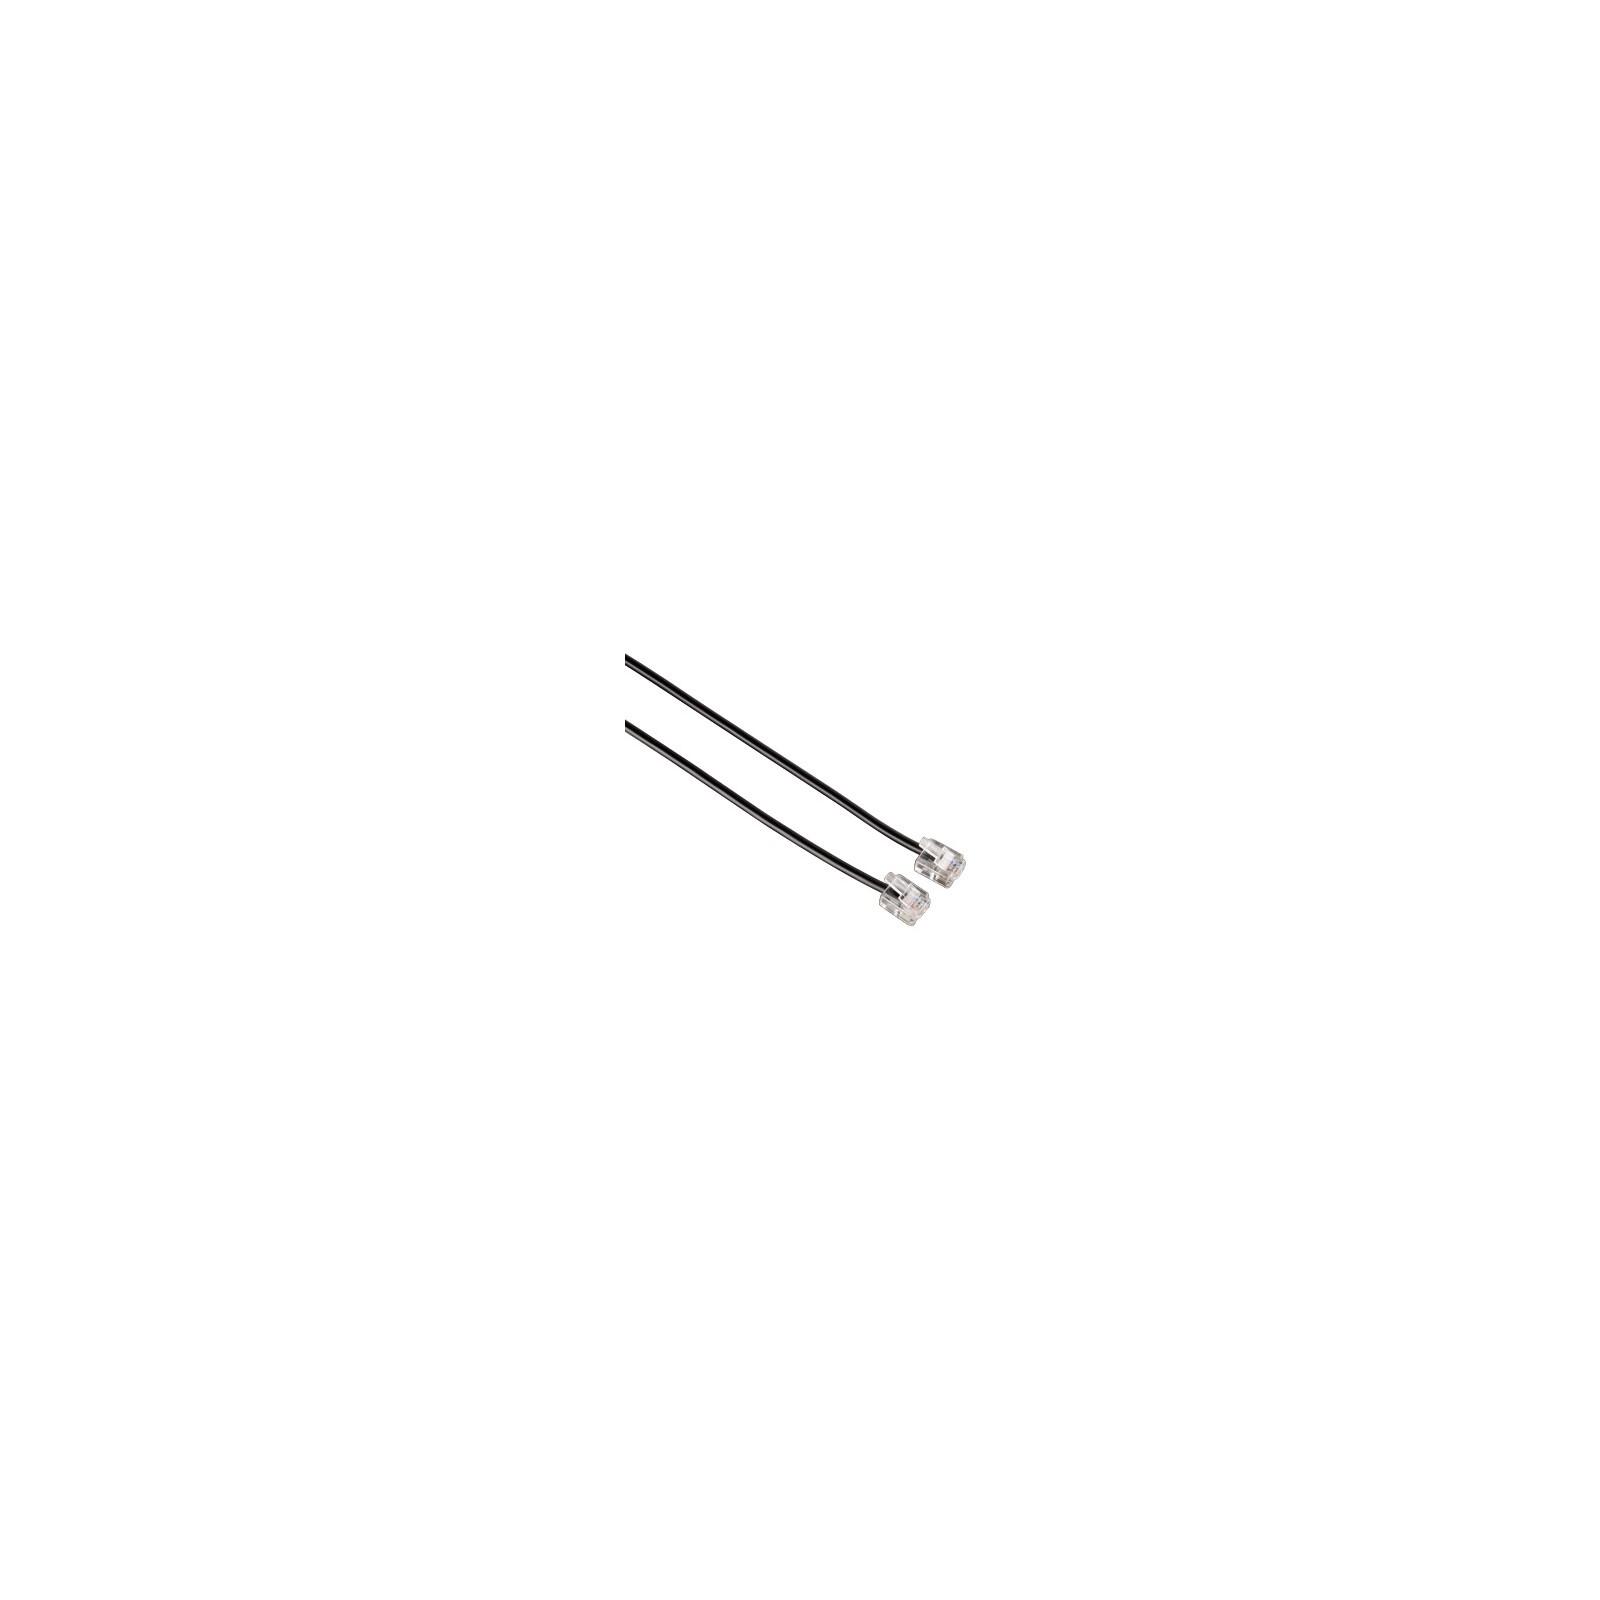 Hama 44934 Modularkabel, Stecker 6p4c - Stecker 6p4c, 3 m, S